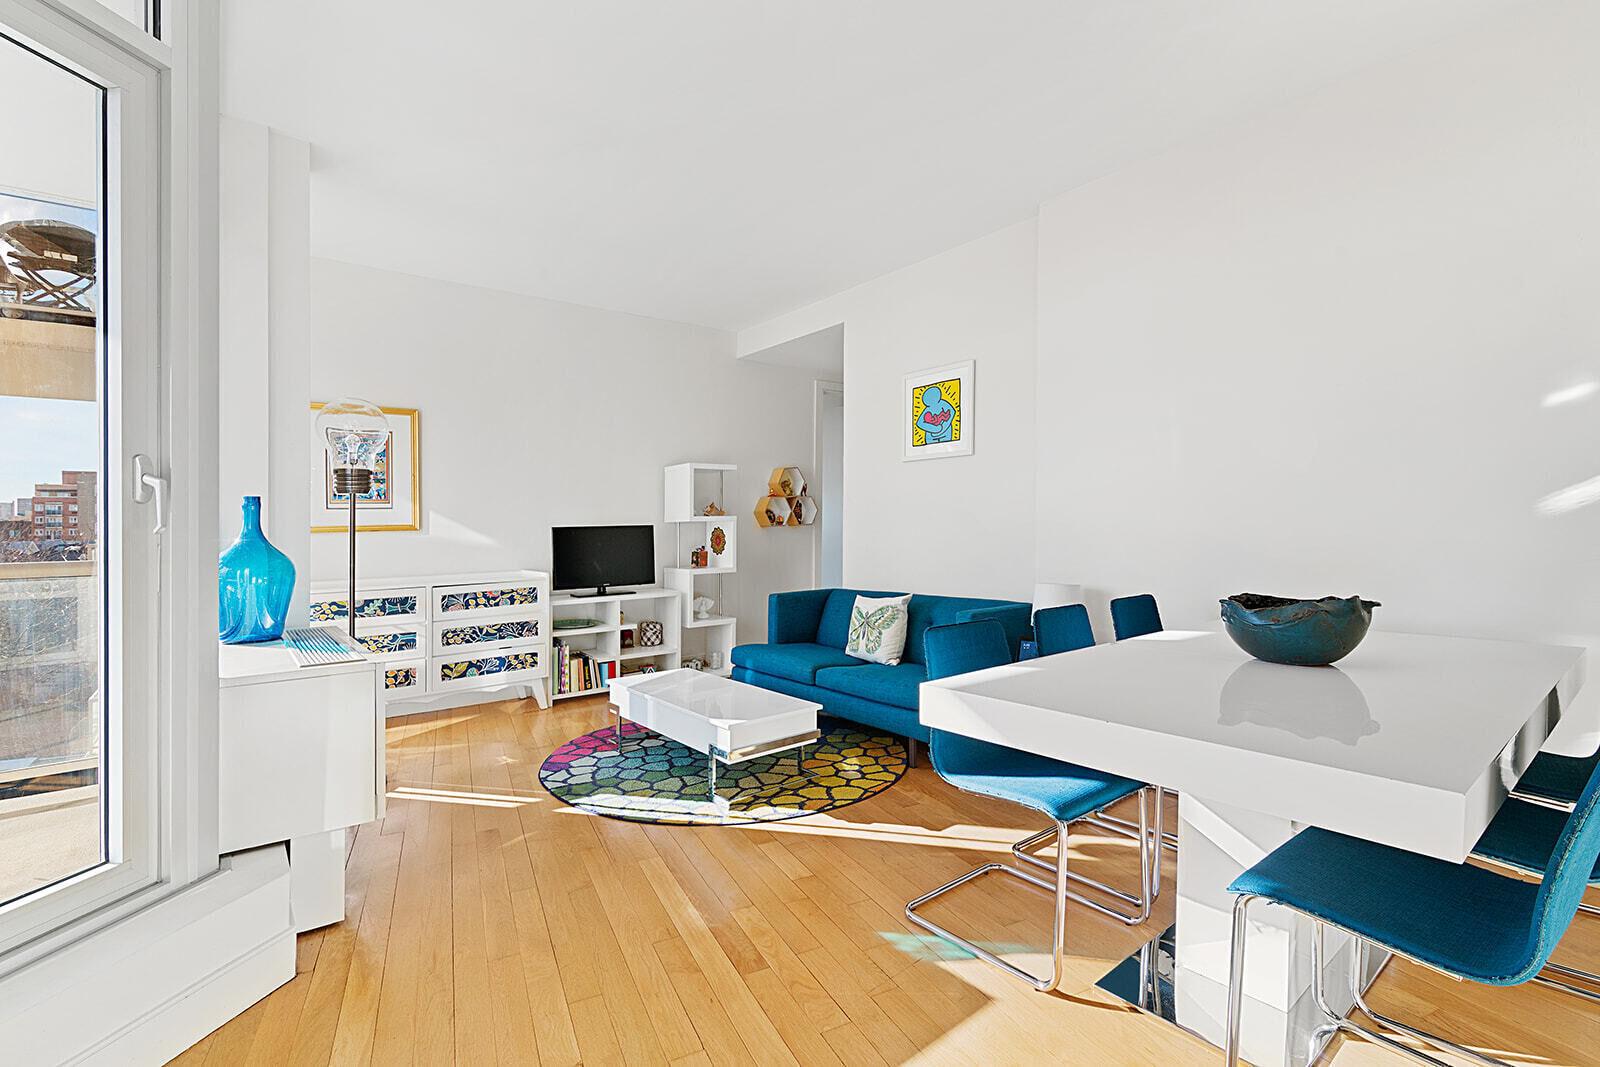 Apartment for sale at 108 Neptune Avenue, Apt 4-K